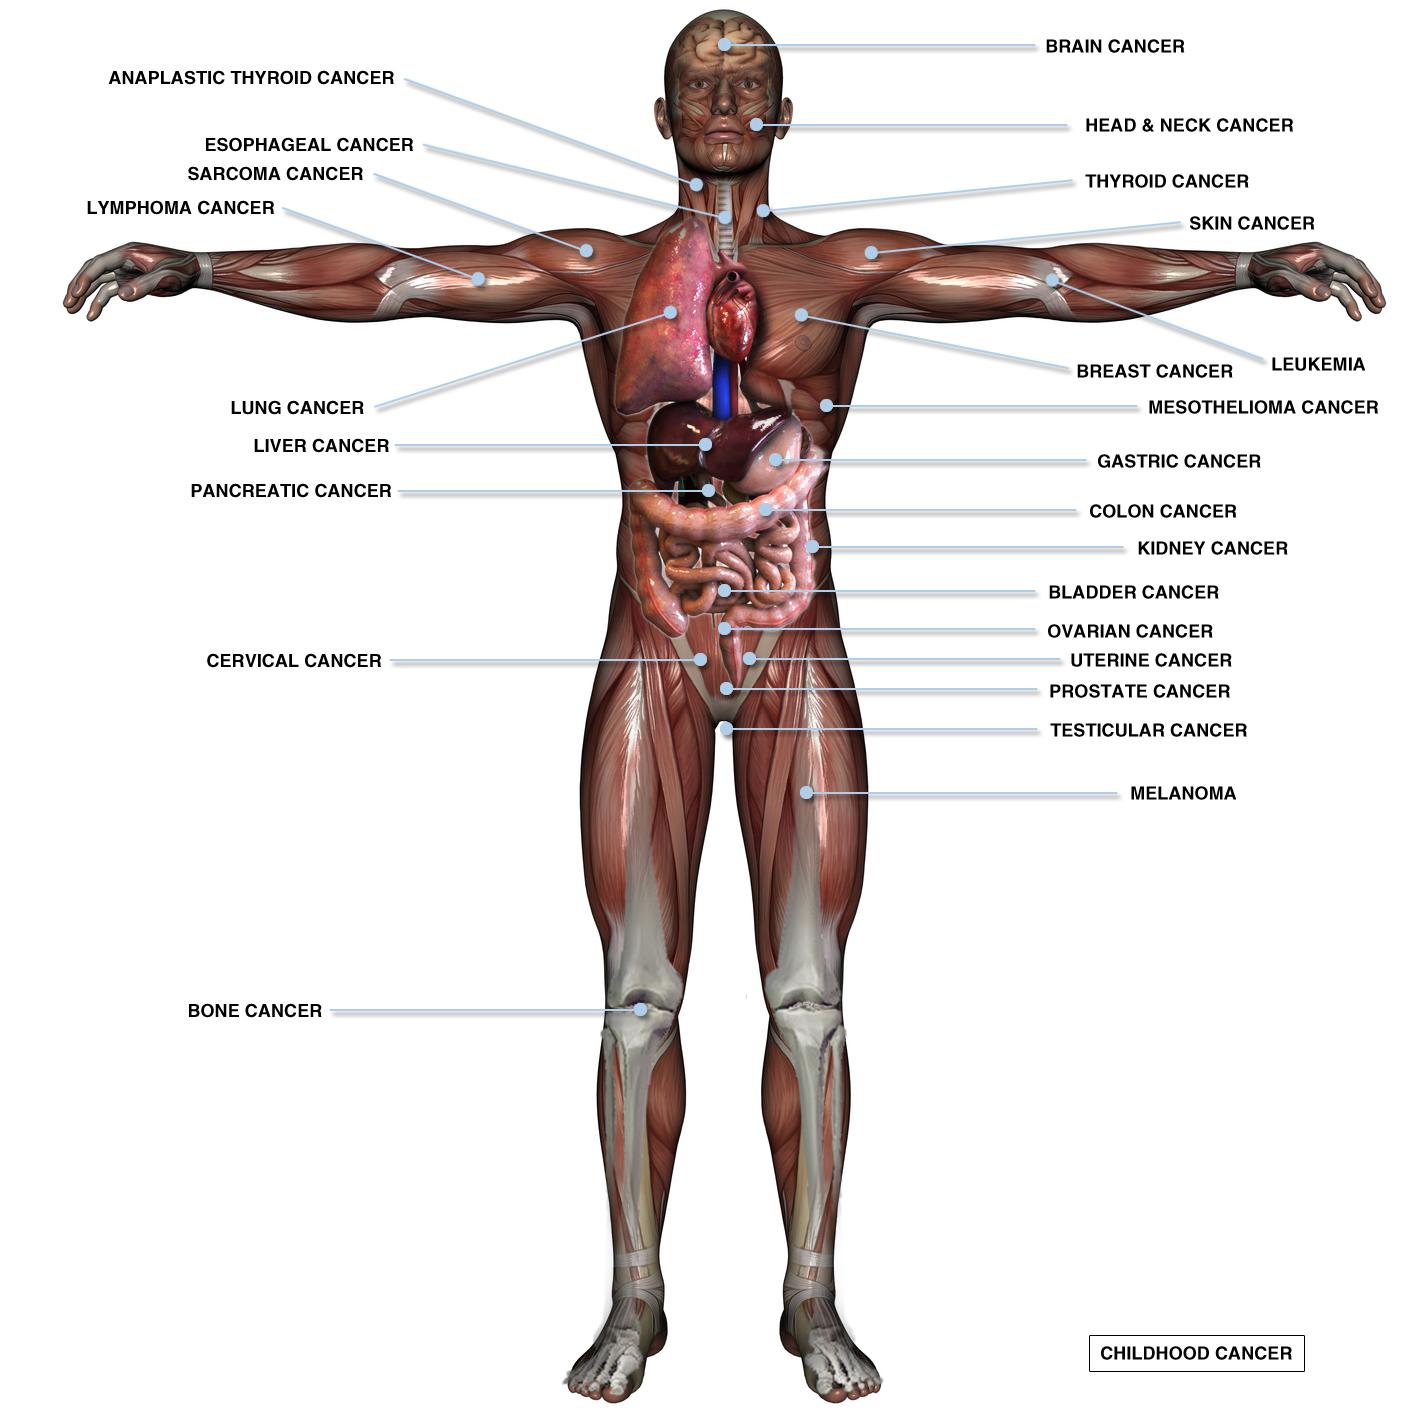 بالصور صور جسم الانسان , اروع صور لجسم الانسان 791 8